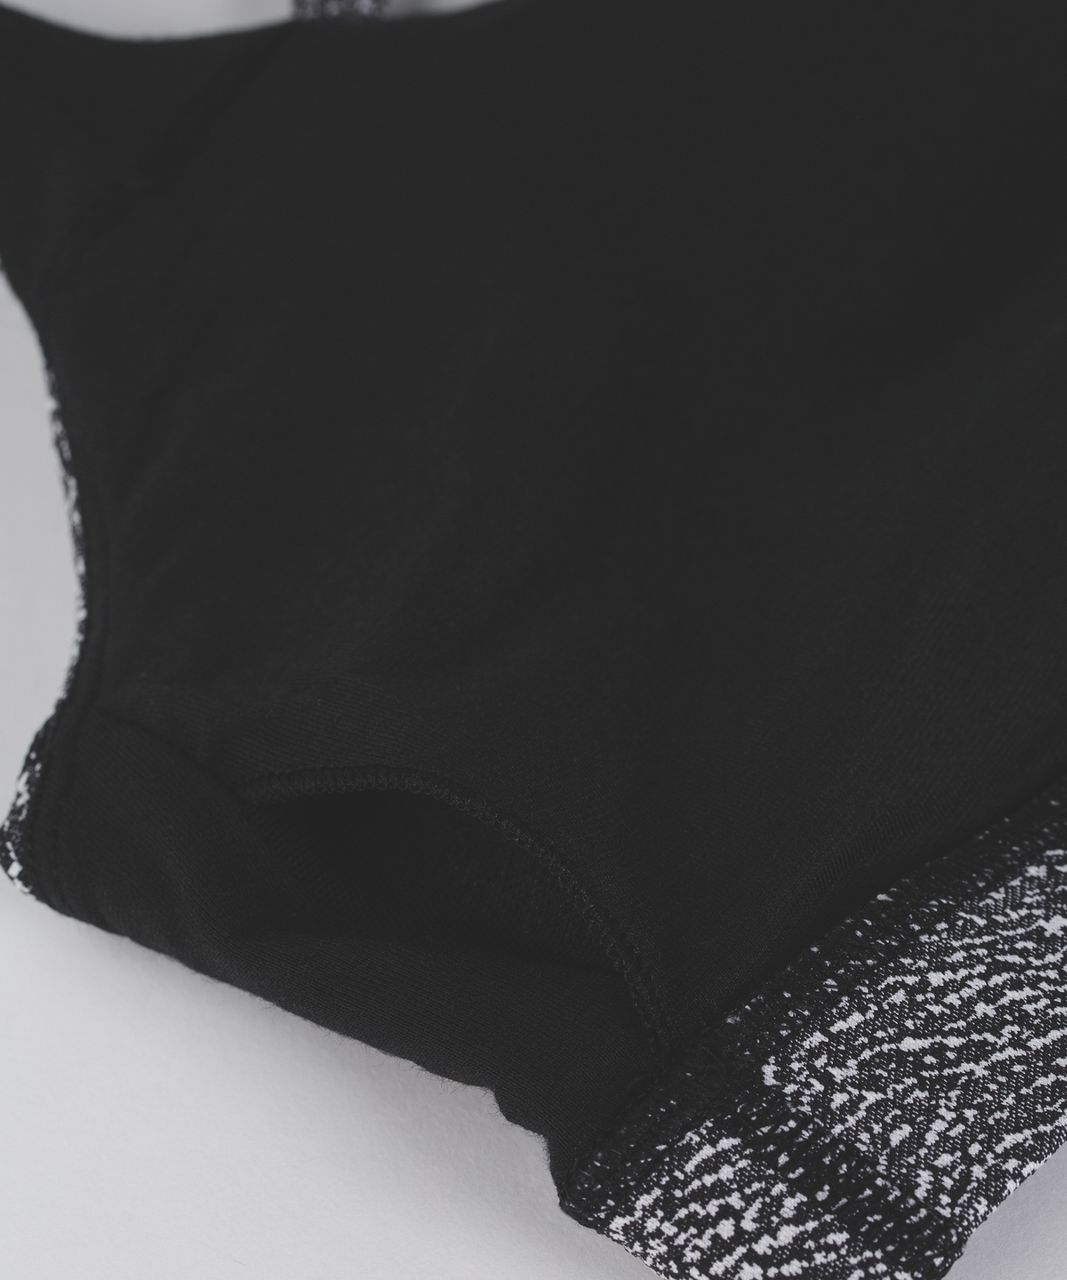 Lululemon Energy Bra - Power Luxtreme Ripple Jacquard Black White